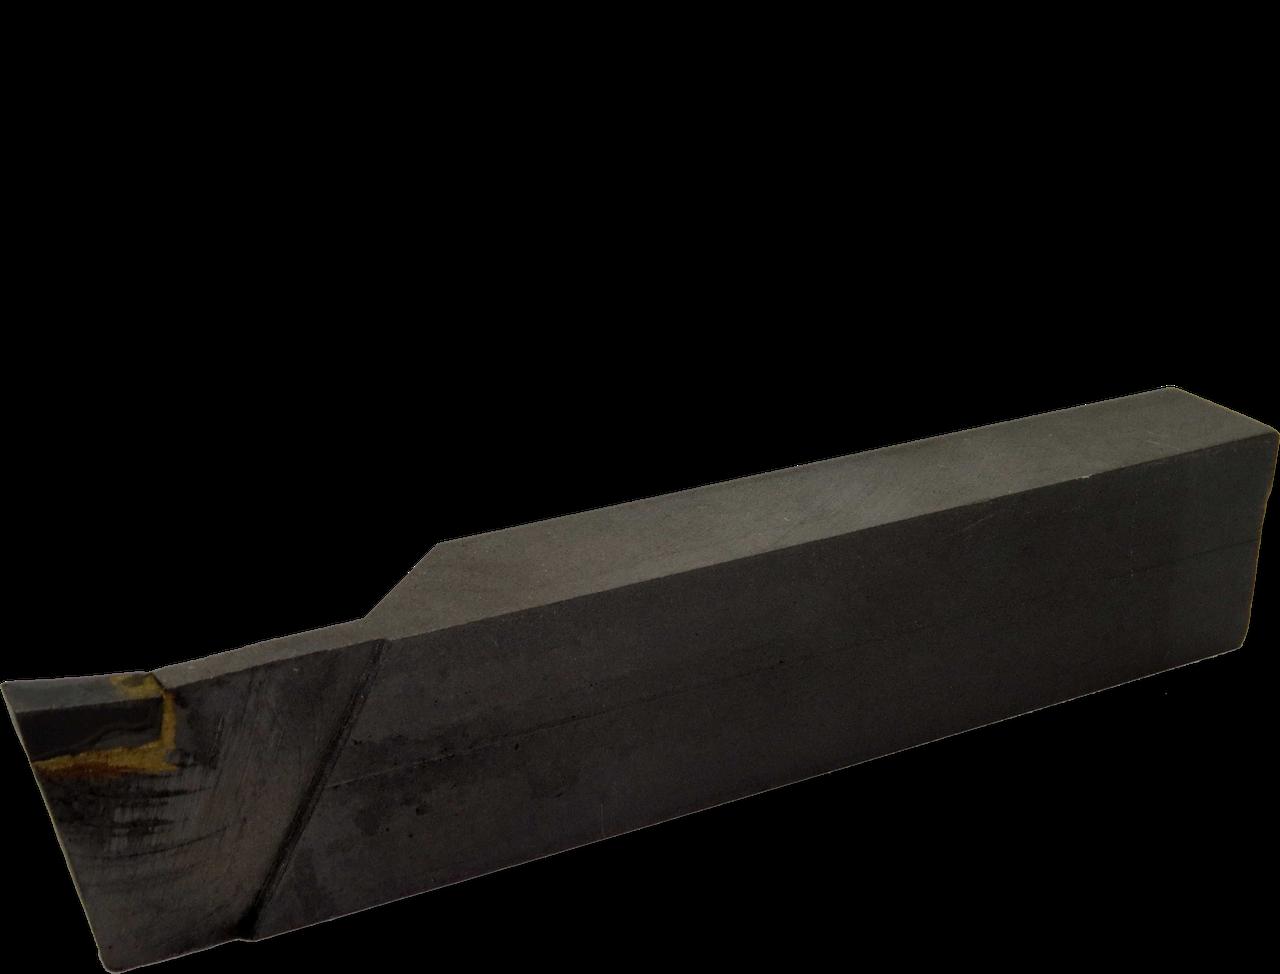 Резец токарный отрезной 32х20х170 СИТО (Т15К6) (Беларусь)